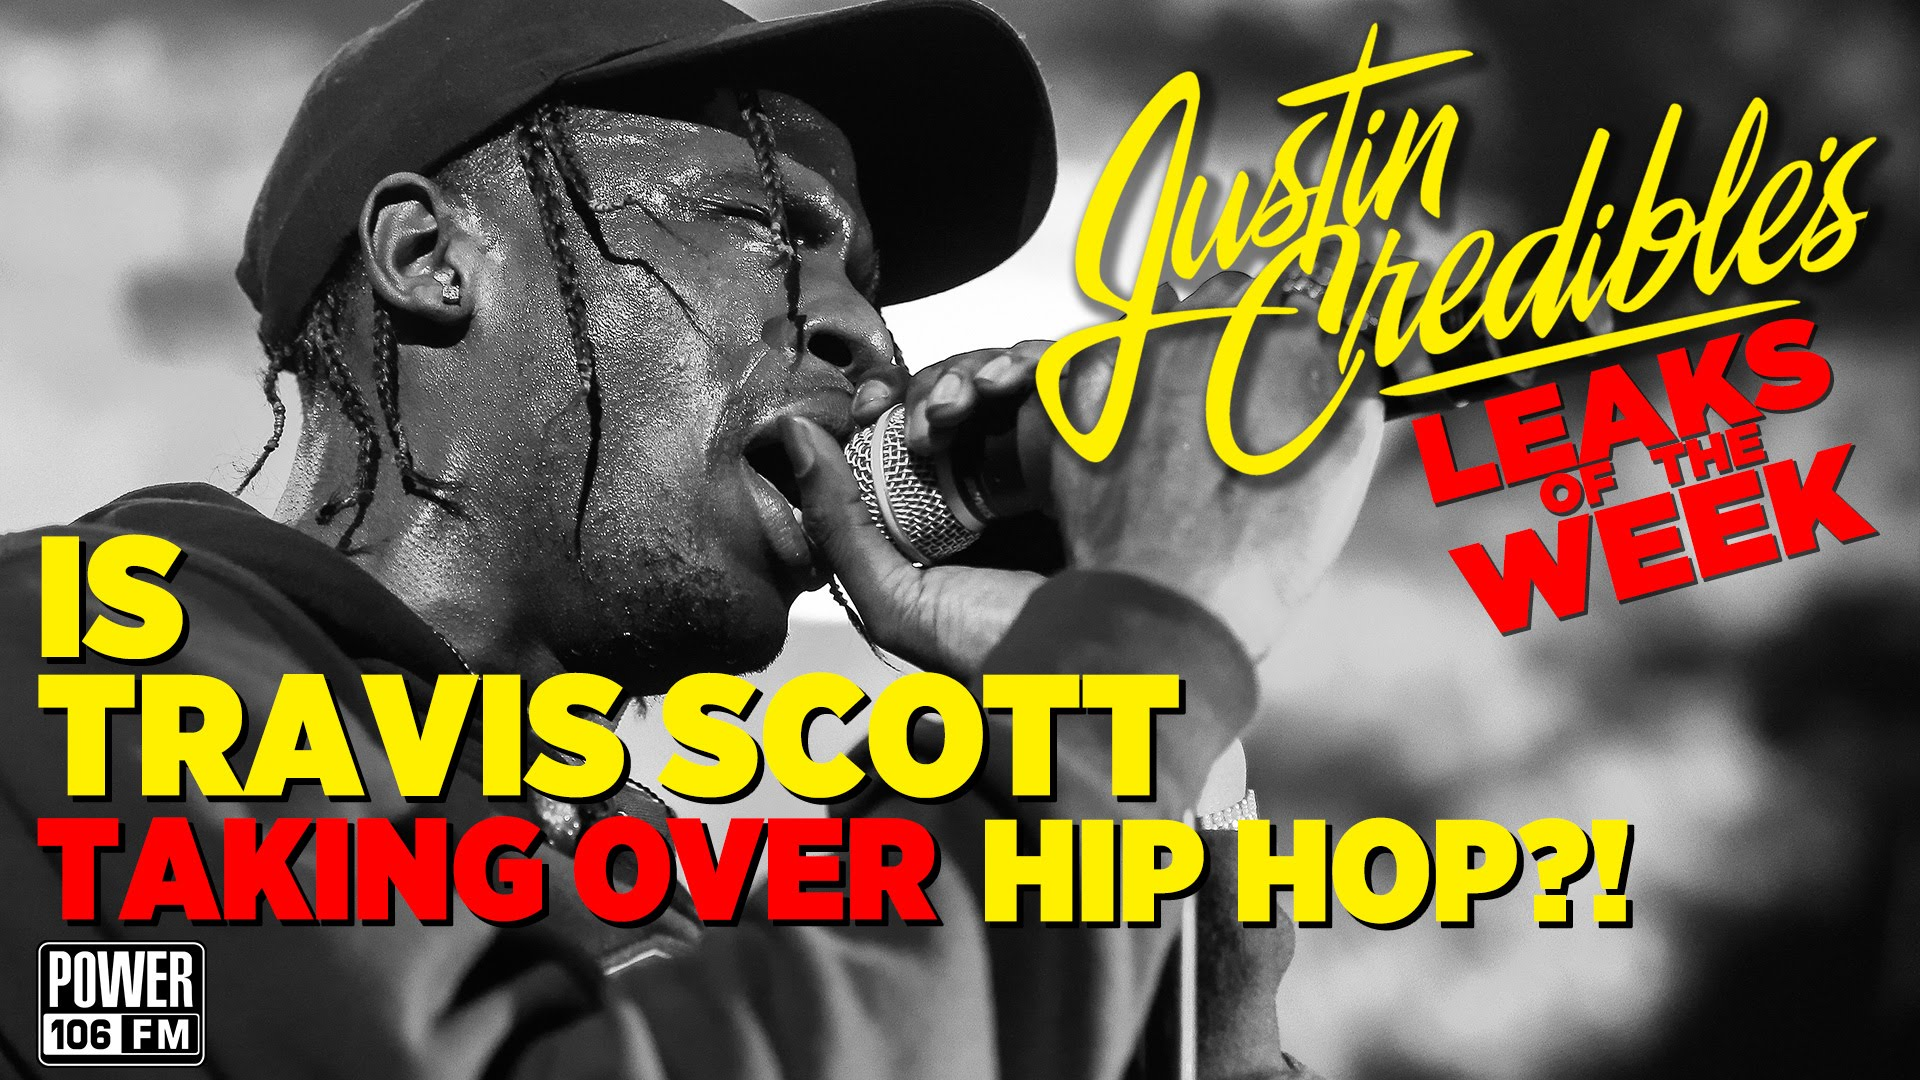 Justin Credible's #LeaksOfTheWeek w/ Travis Scott, Kanye West & Future  (Video)